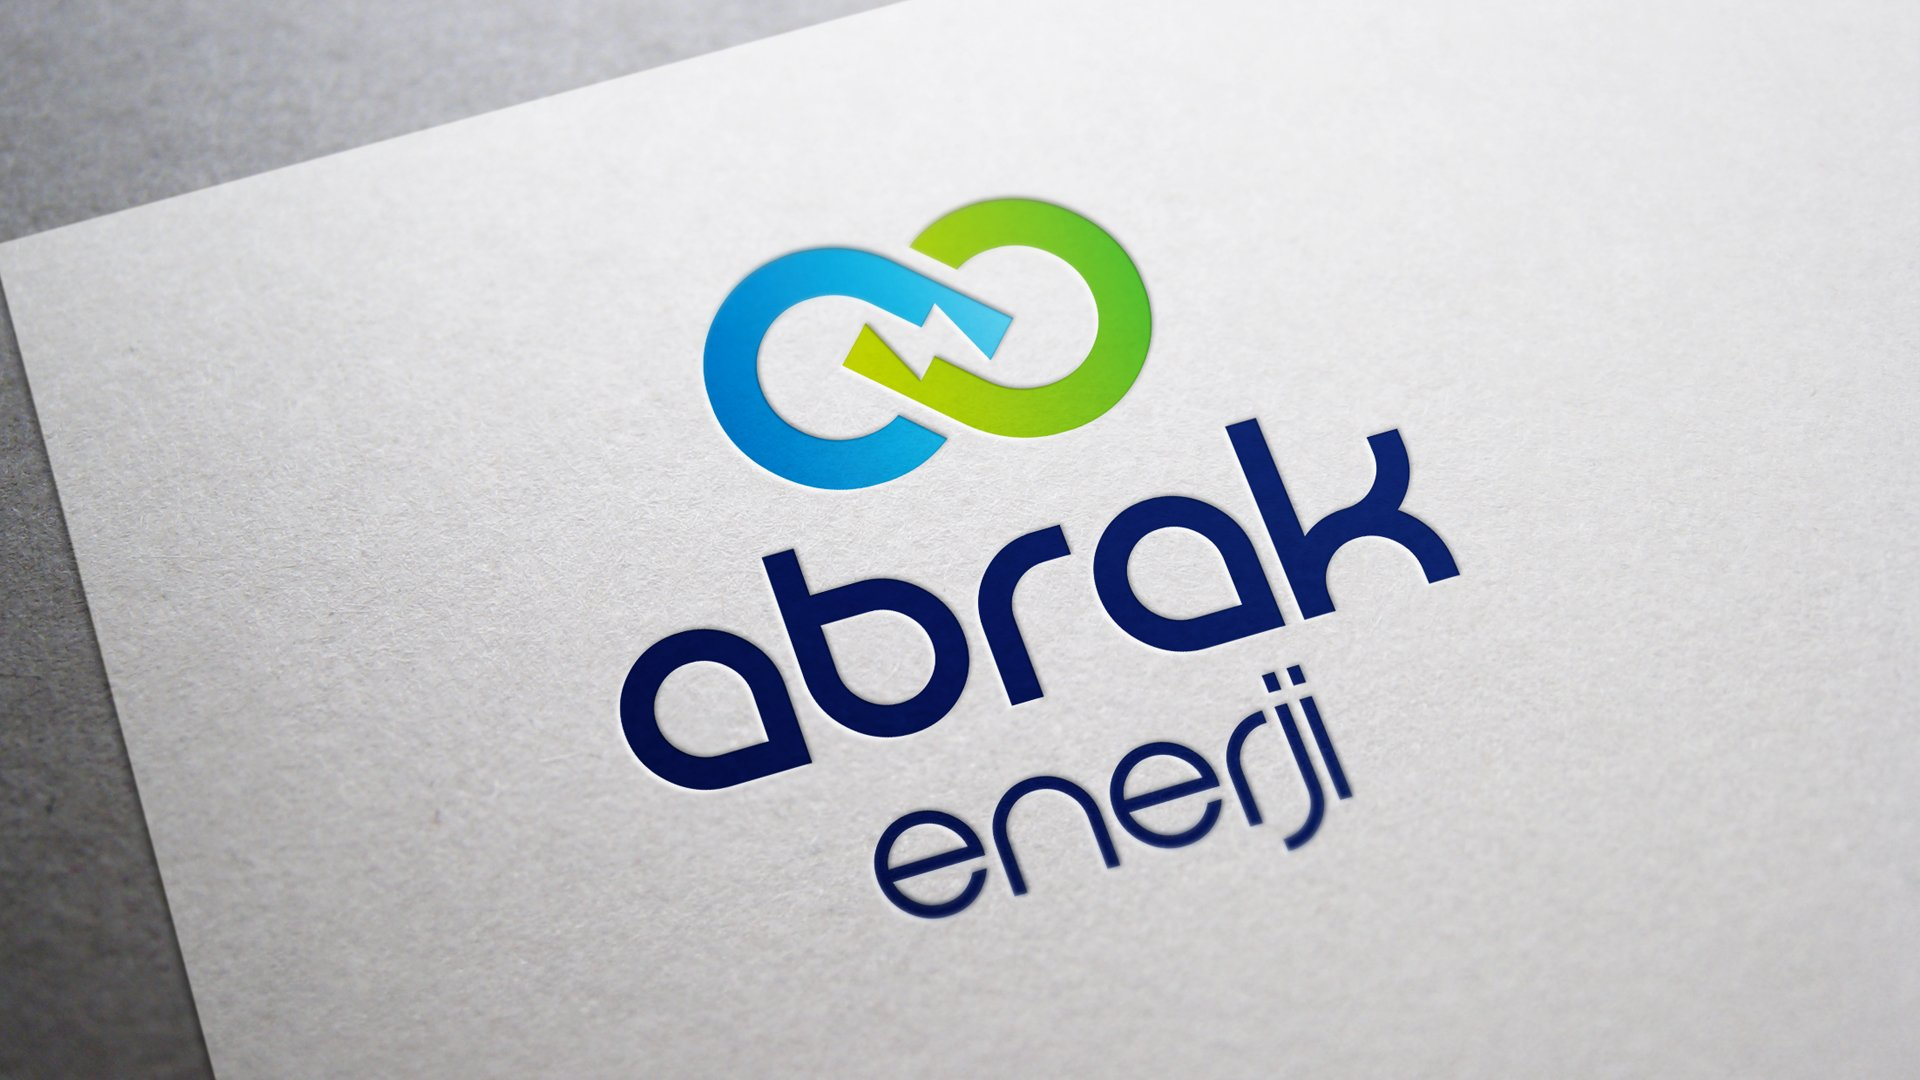 Abrak Enerji